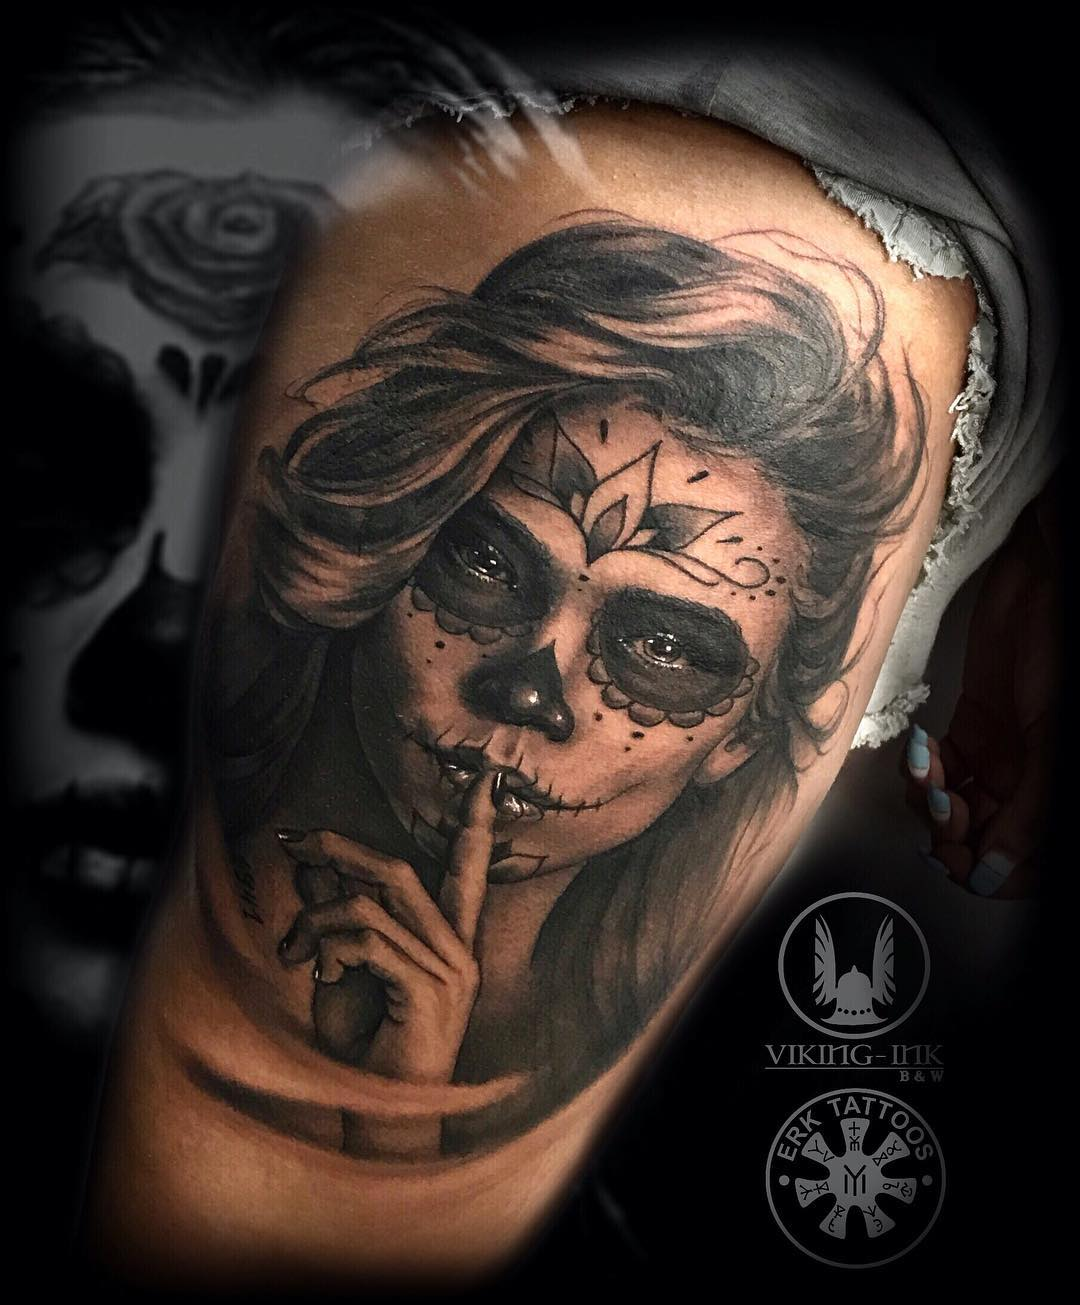 Tatuaje De Catrina Obsession Tattoo